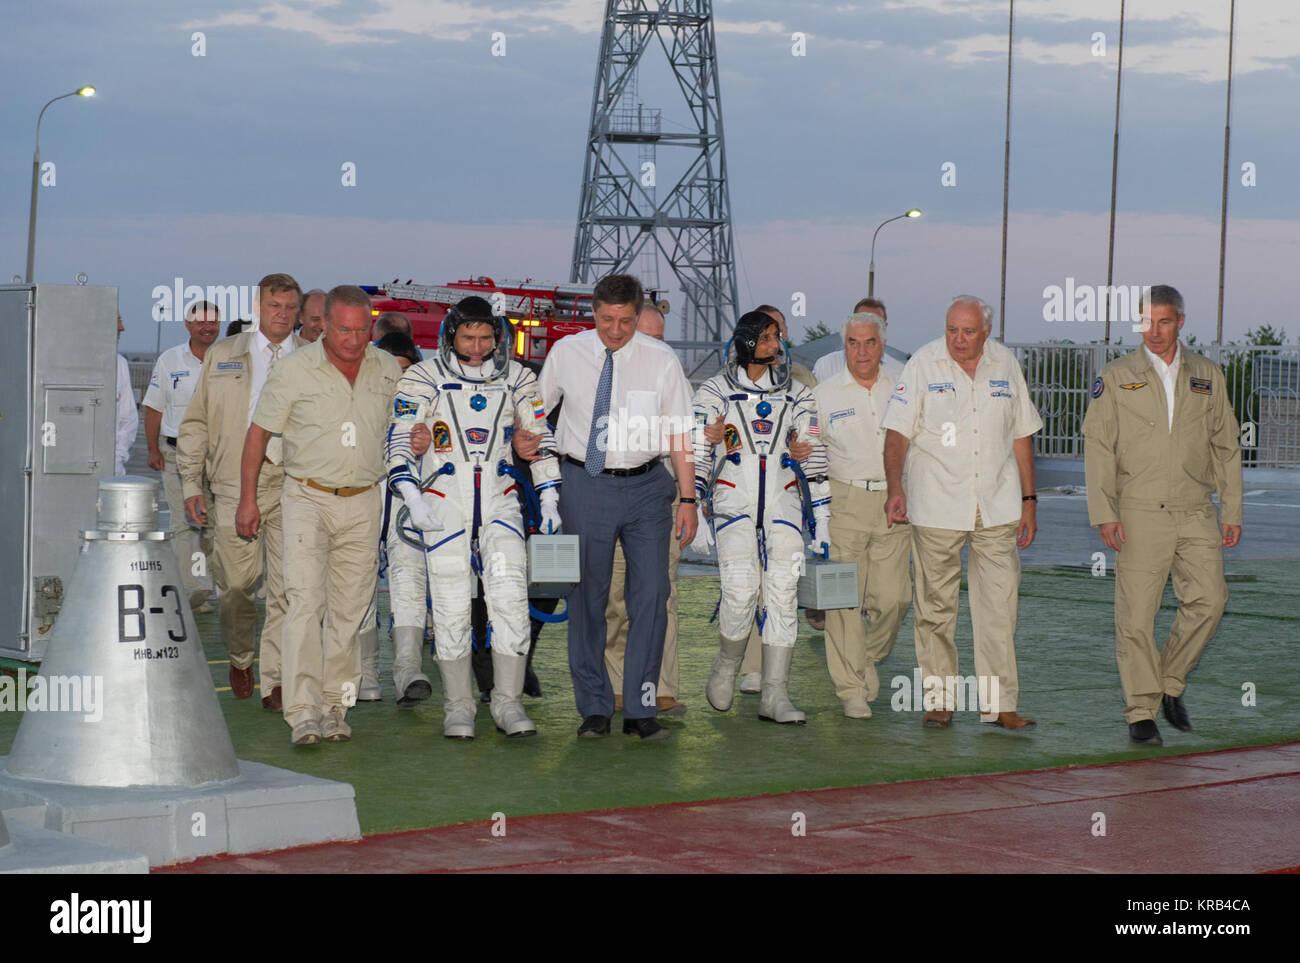 Expedition 32 Soyuz Commander Yuri Malenchenko, second from left, and NASA Flight Engineer Sunita Williams are escorted - Stock Image